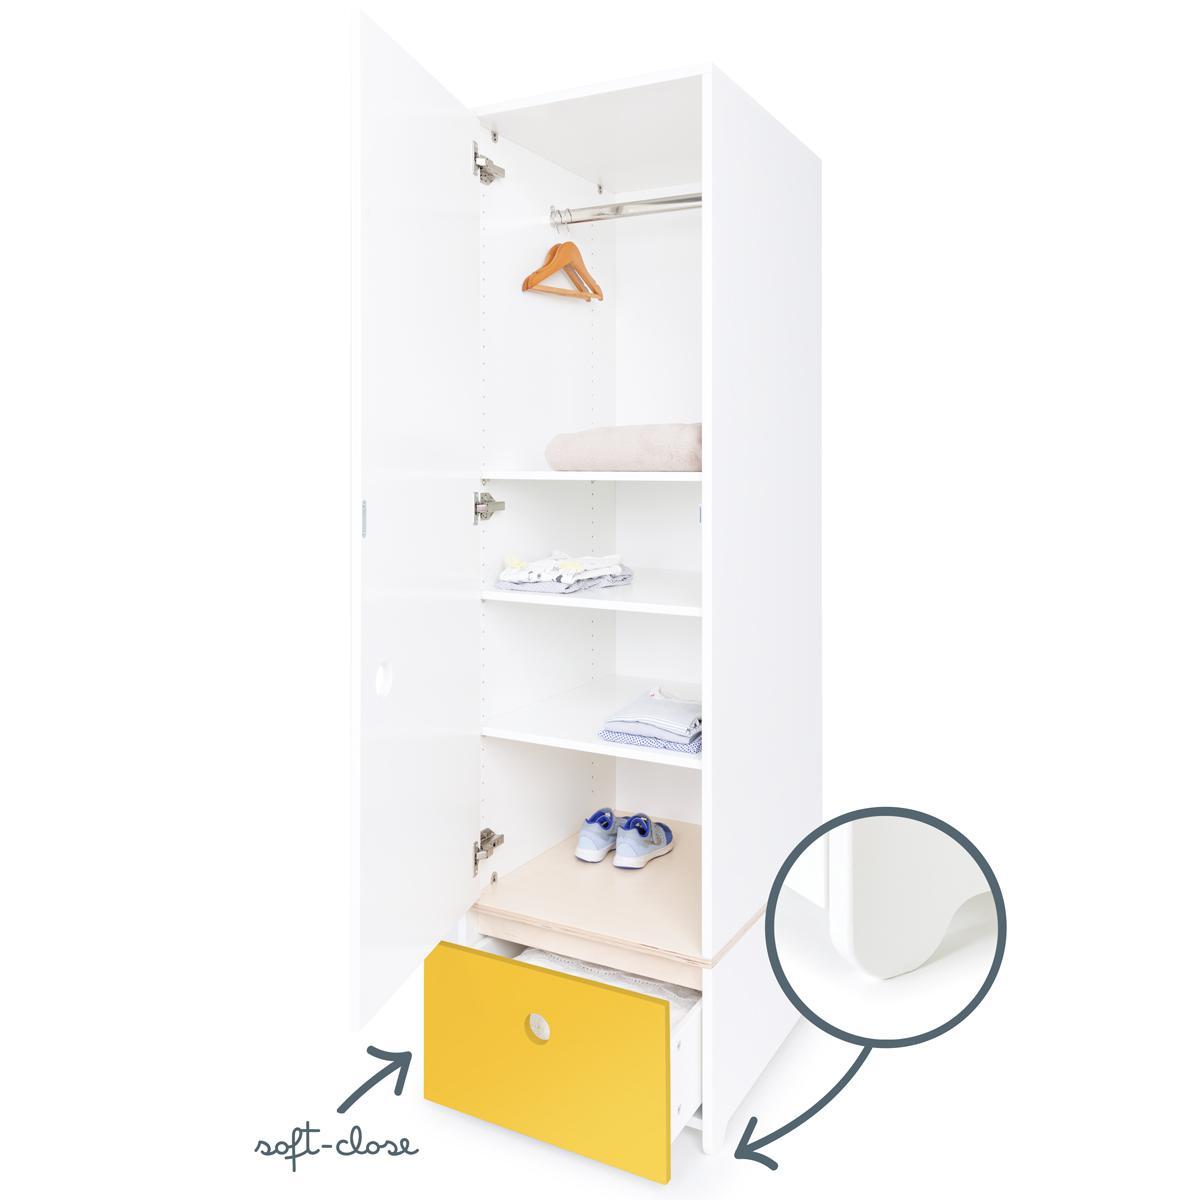 Armario 1 puerta COLORFLEX cajón frontal nectar yellow